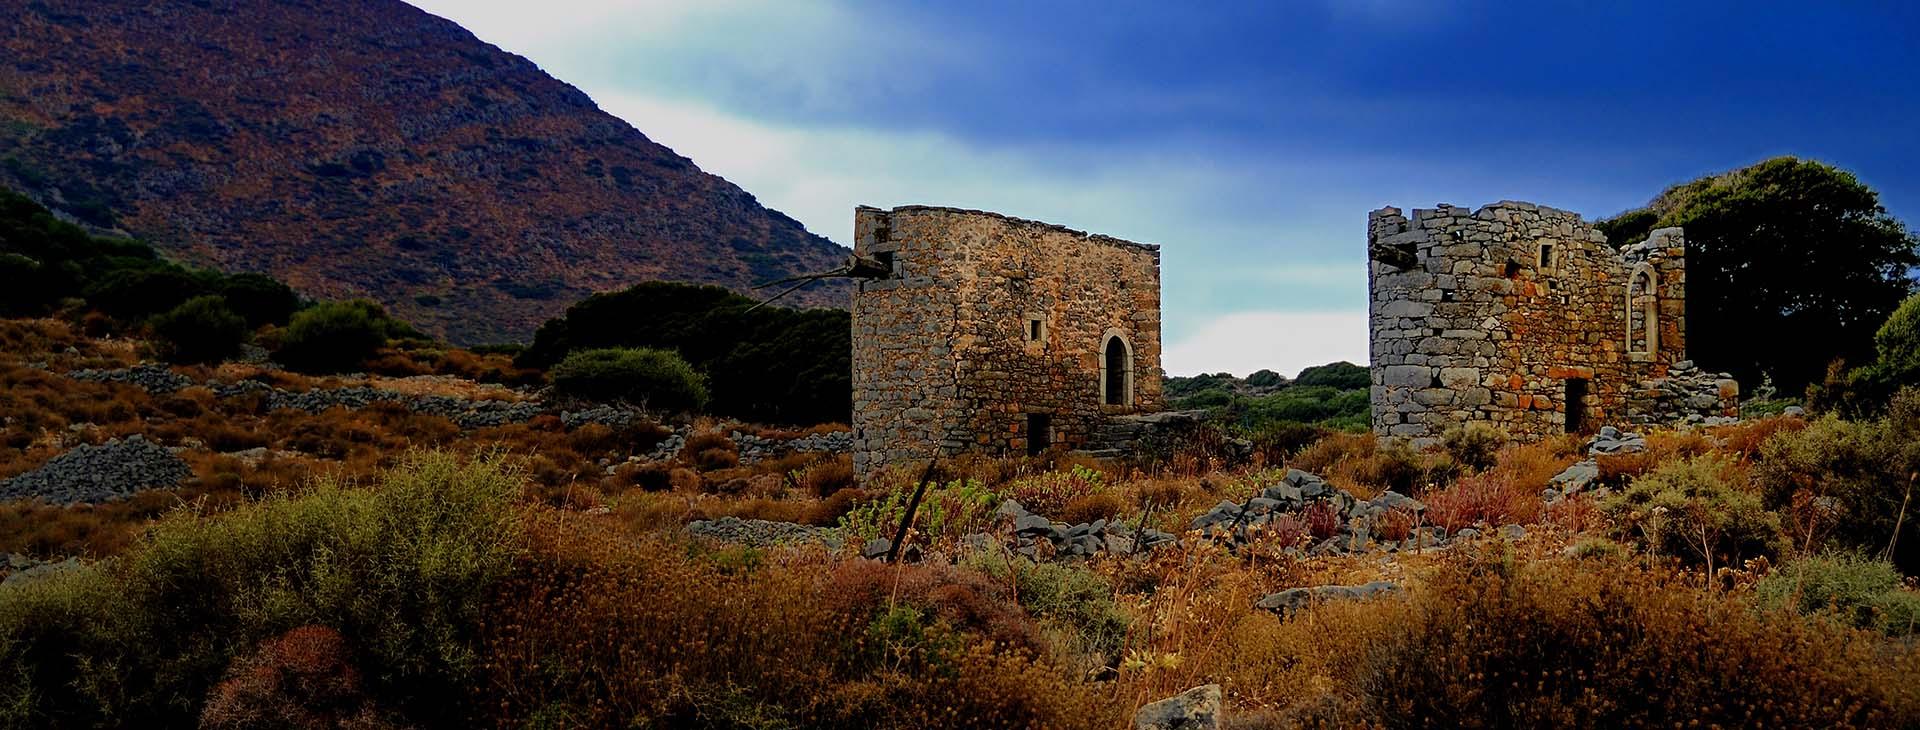 Windmills at the Lasithi Plateau, Lassithi